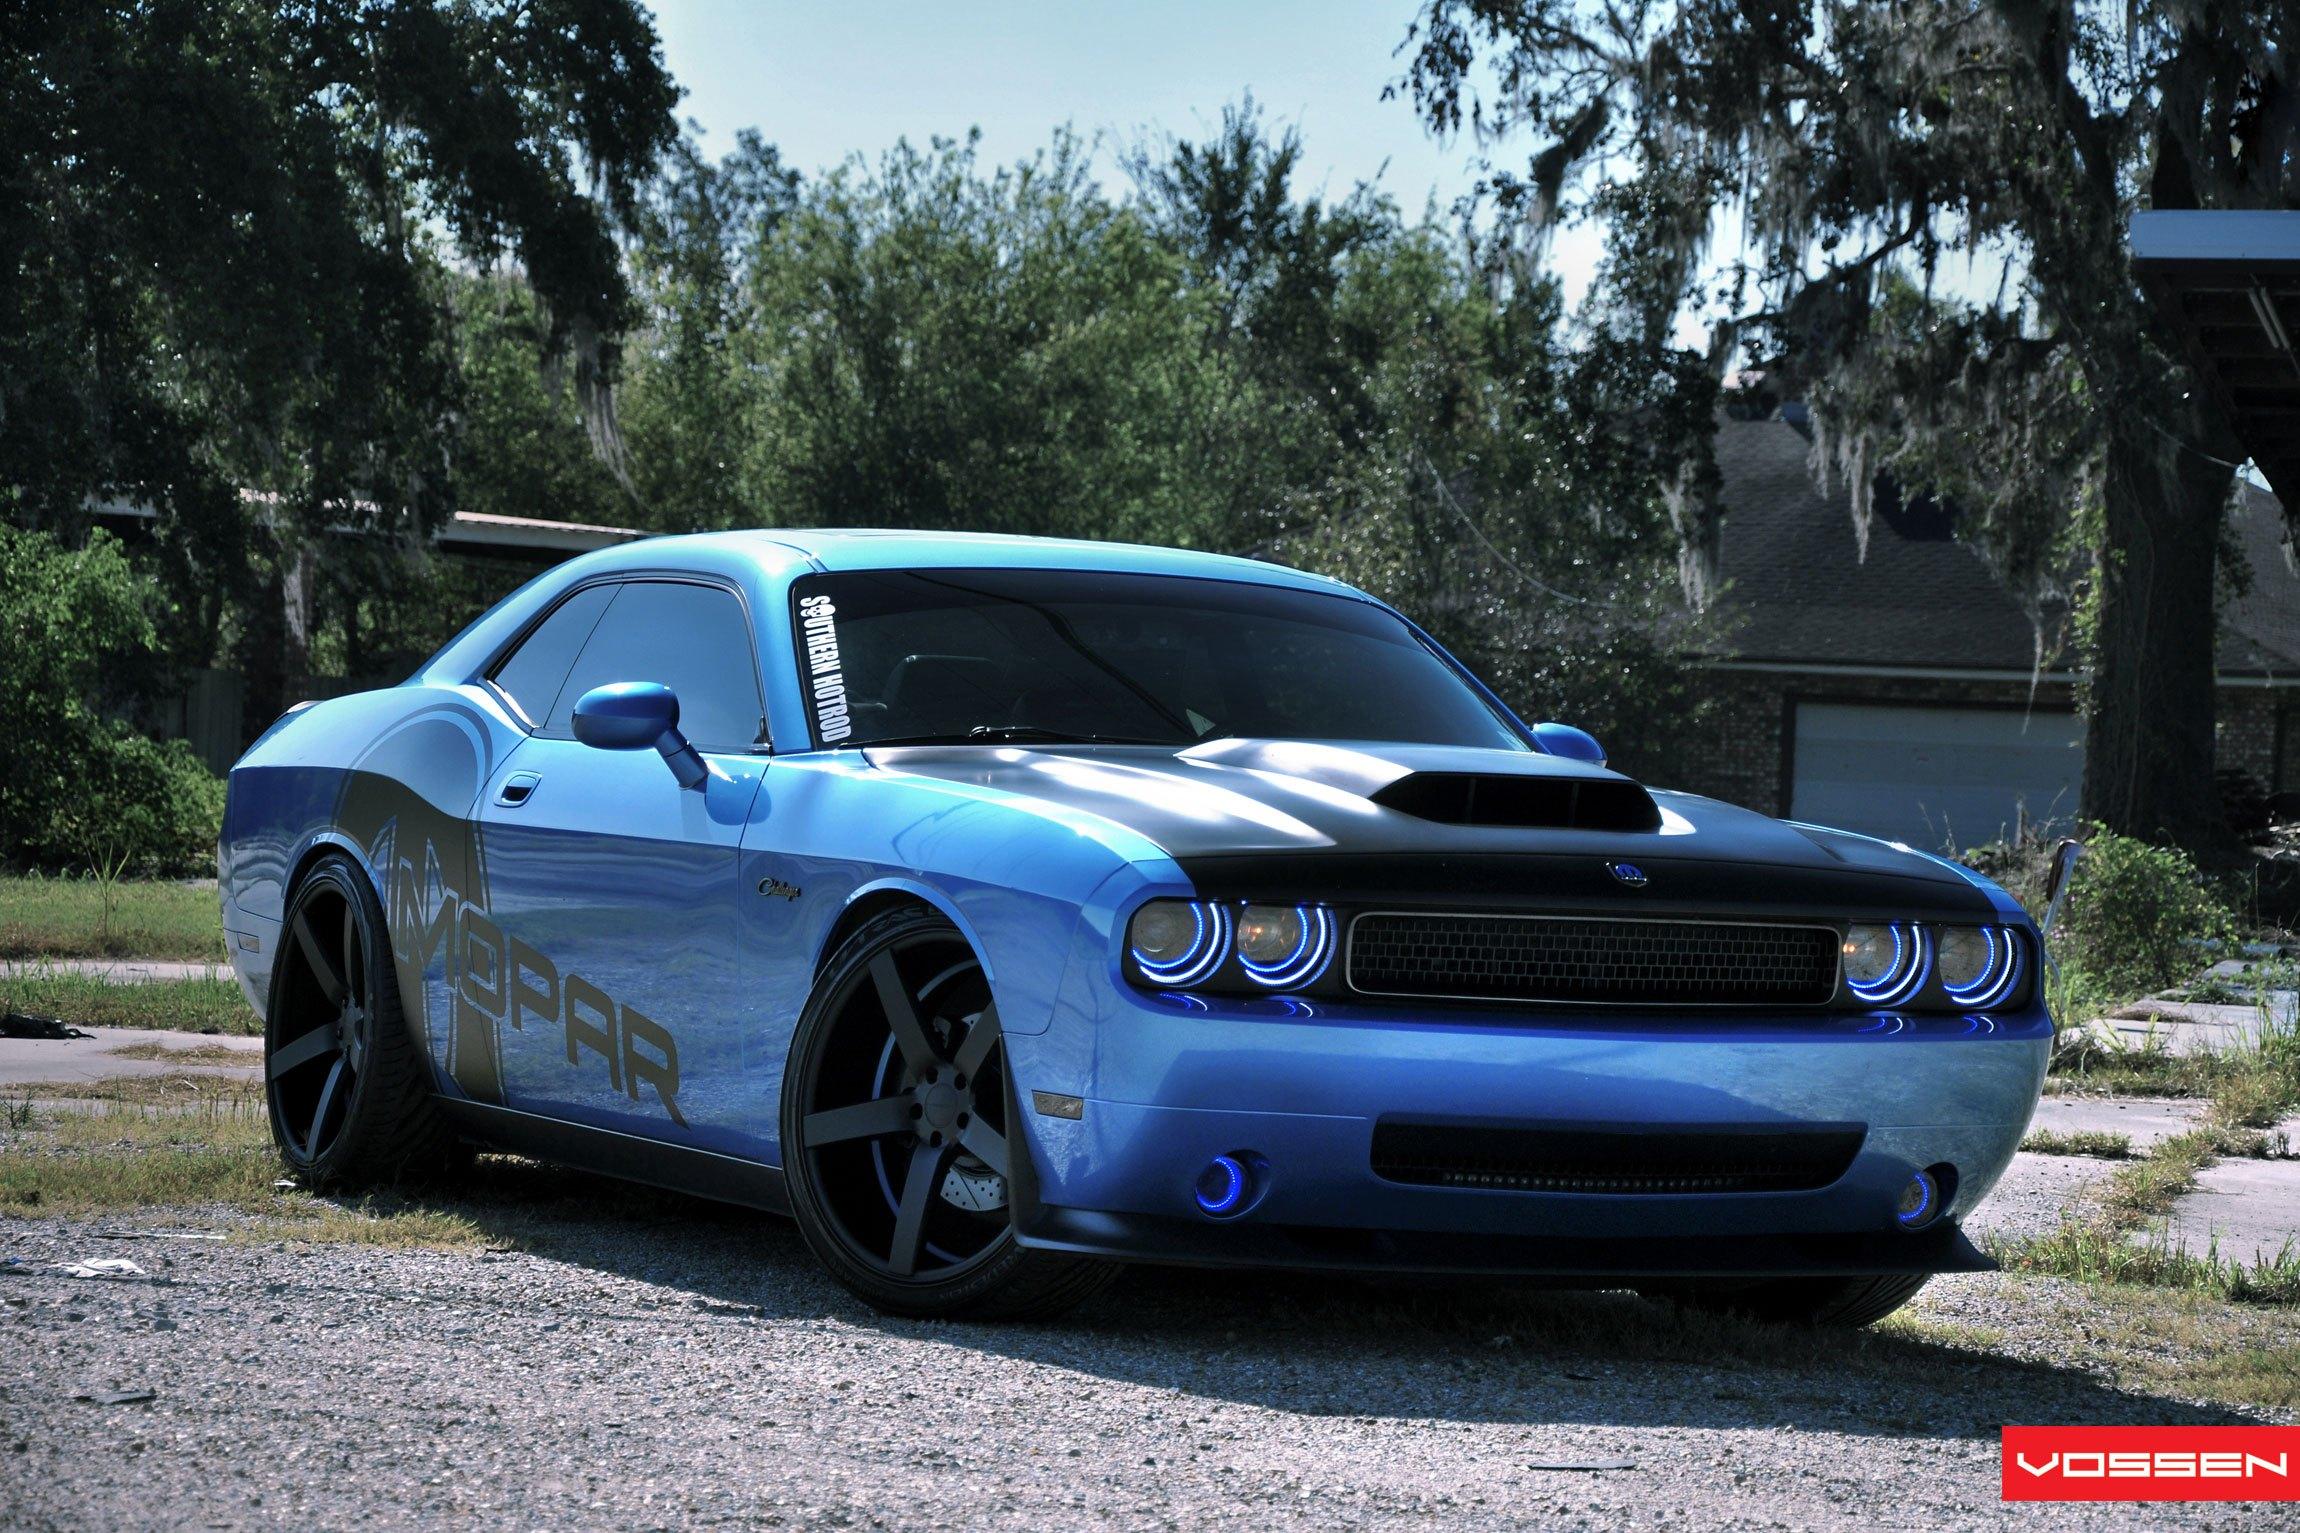 Mopar or no Car: Customized Blue Dodge Challenger — CARiD com Gallery